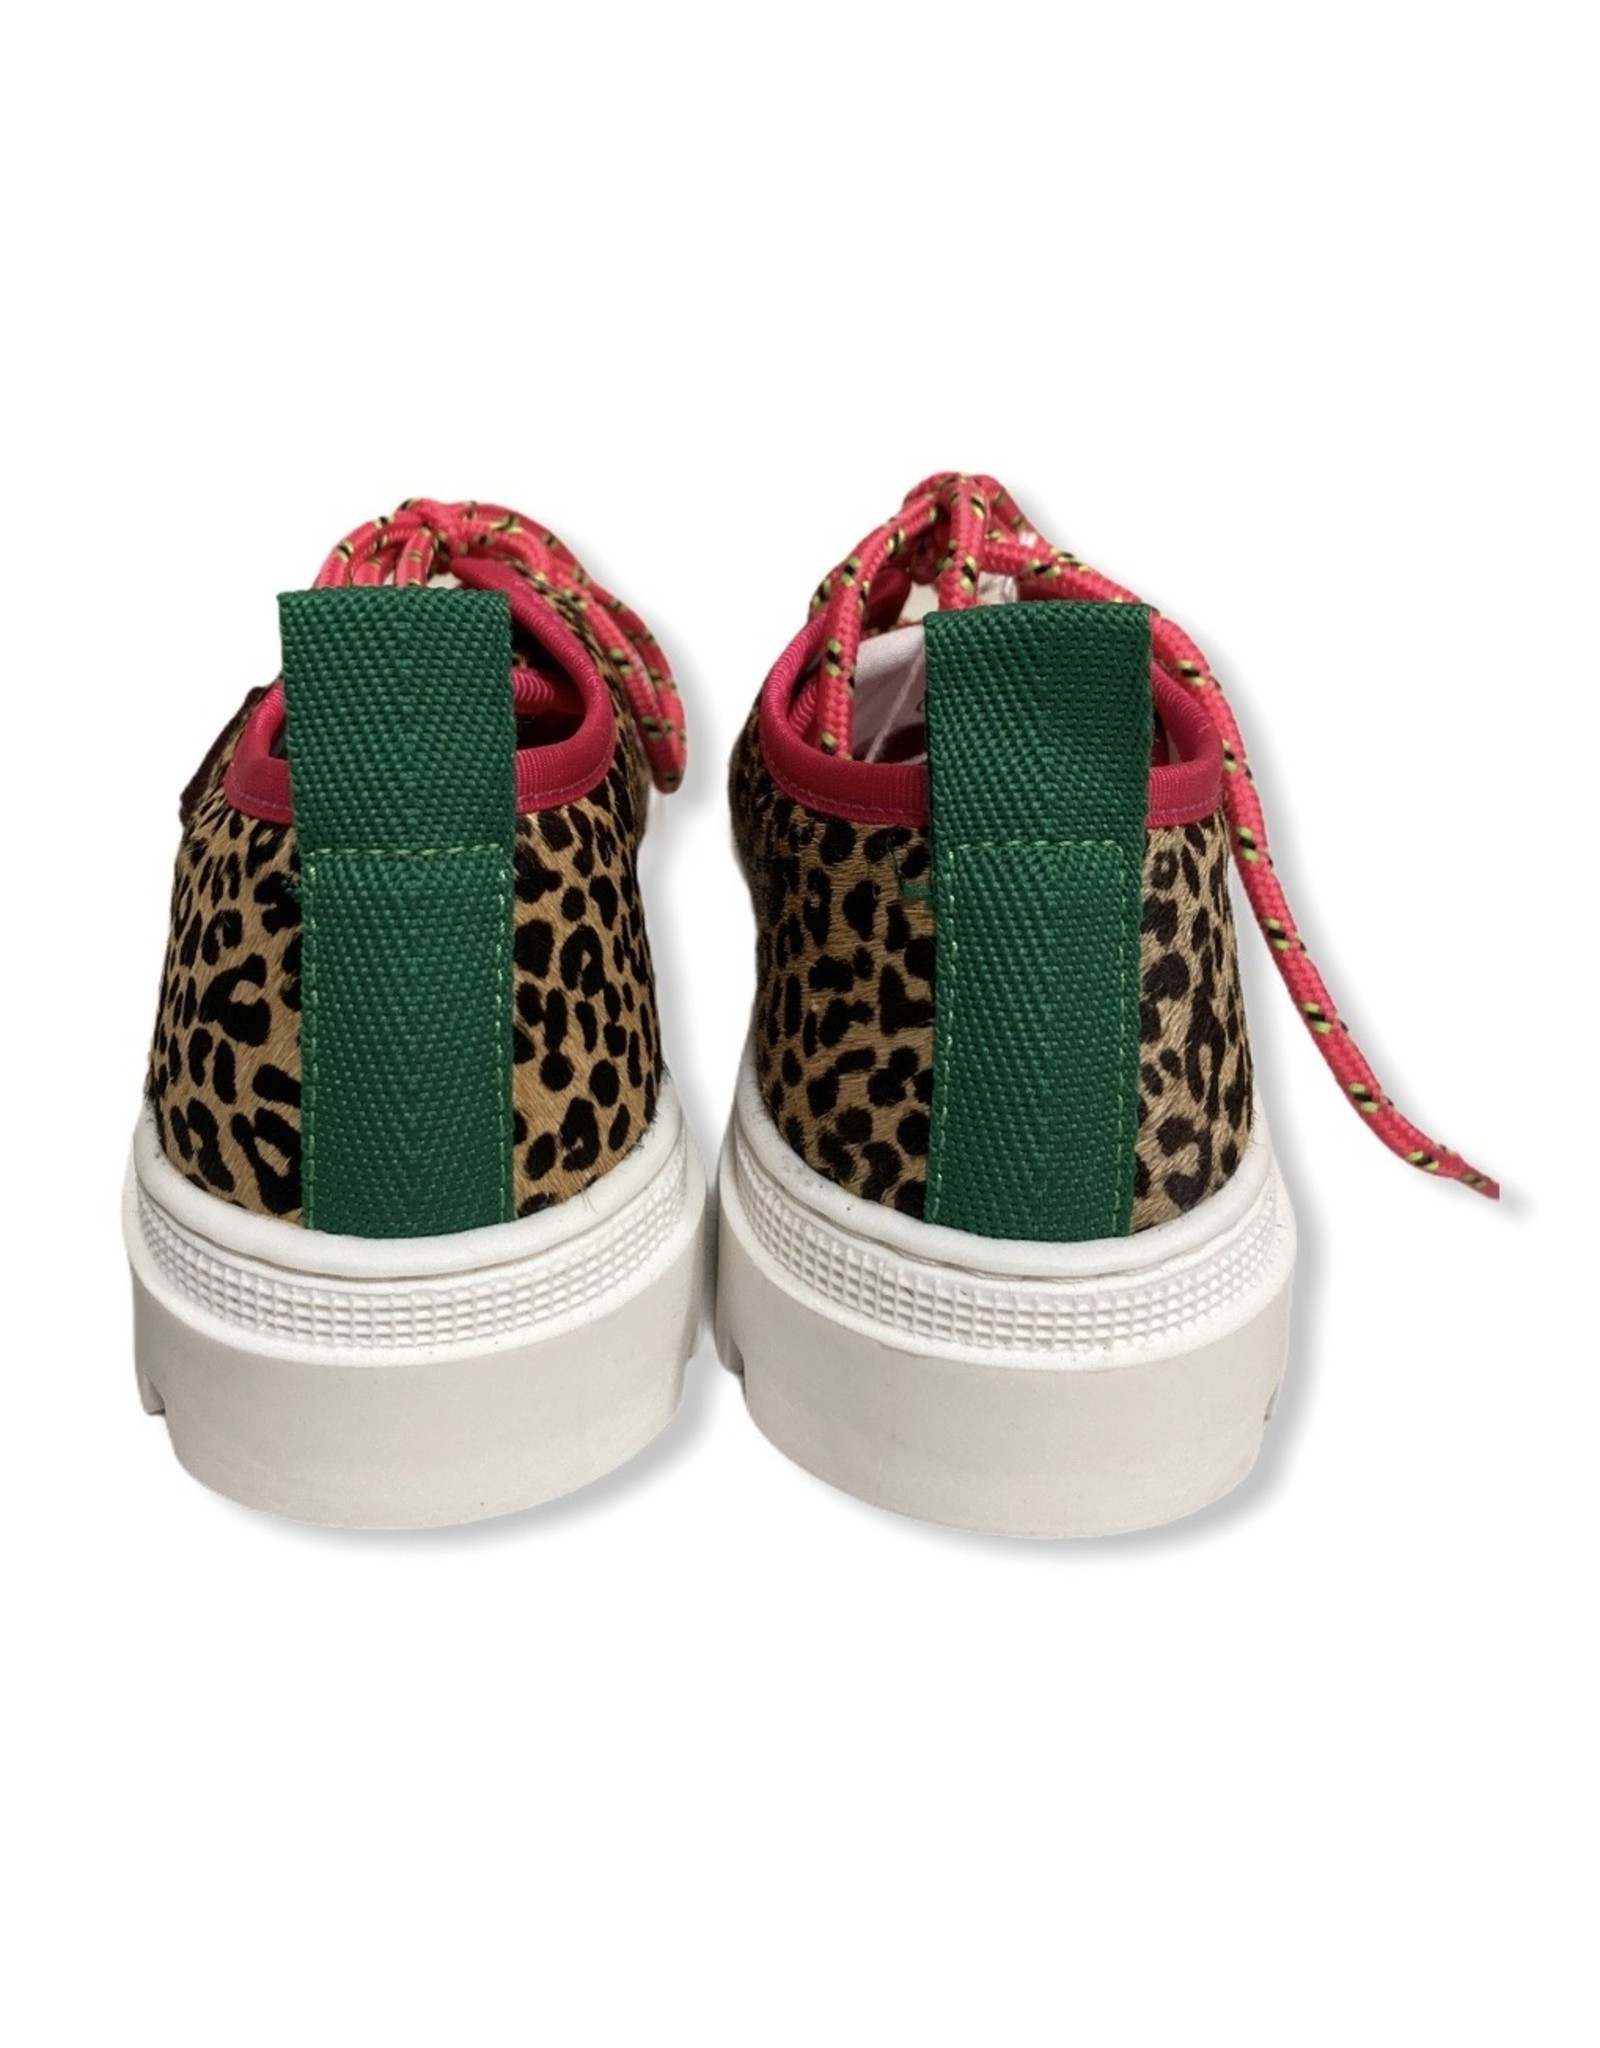 Maison Mangostan Maison Mangostan Gungo leopard stapper